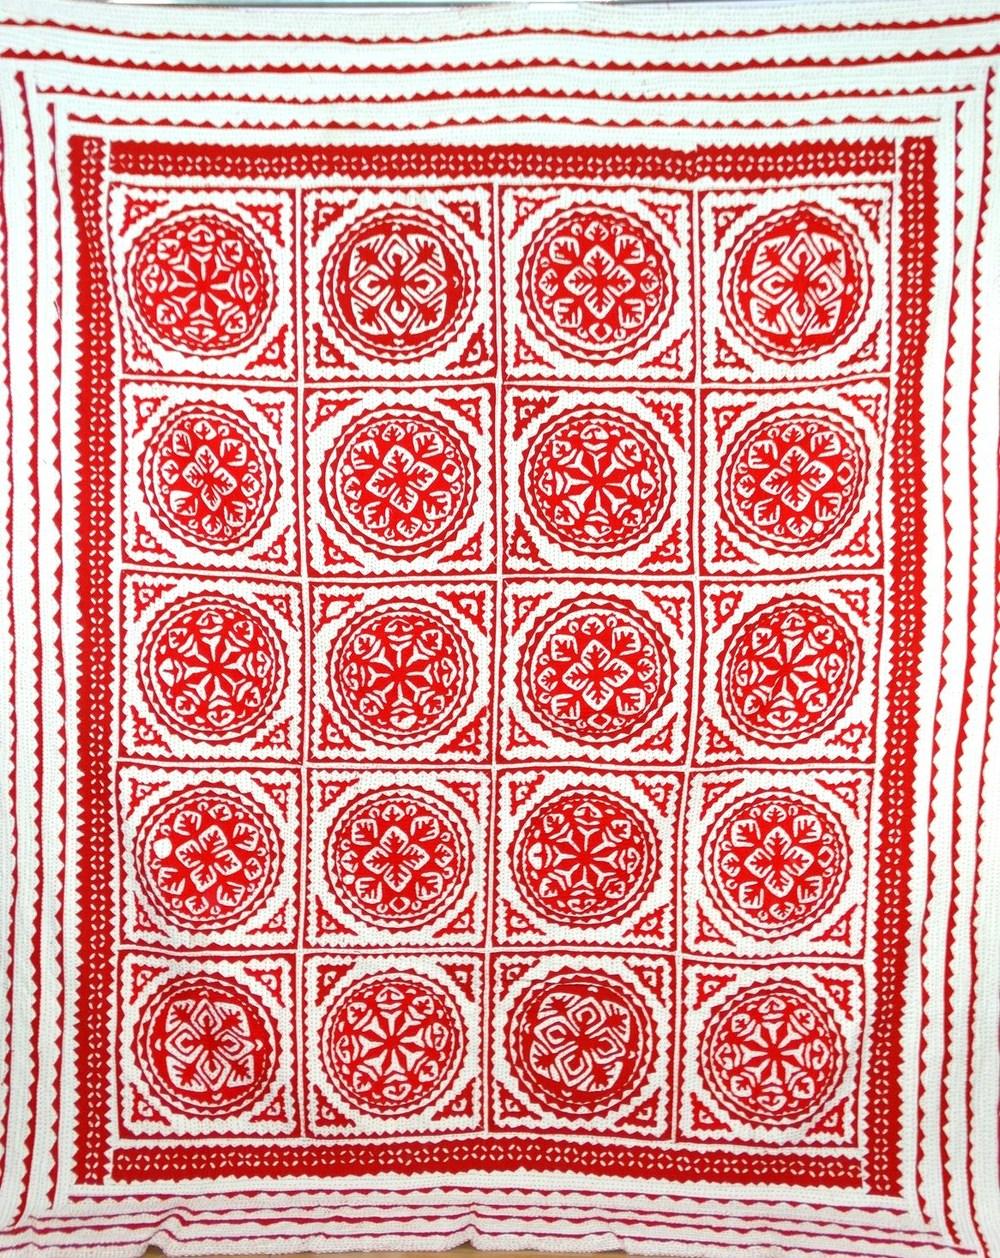 Red Applique Kantha Quilt Patchwork Bedspread Cotton Handmade ...